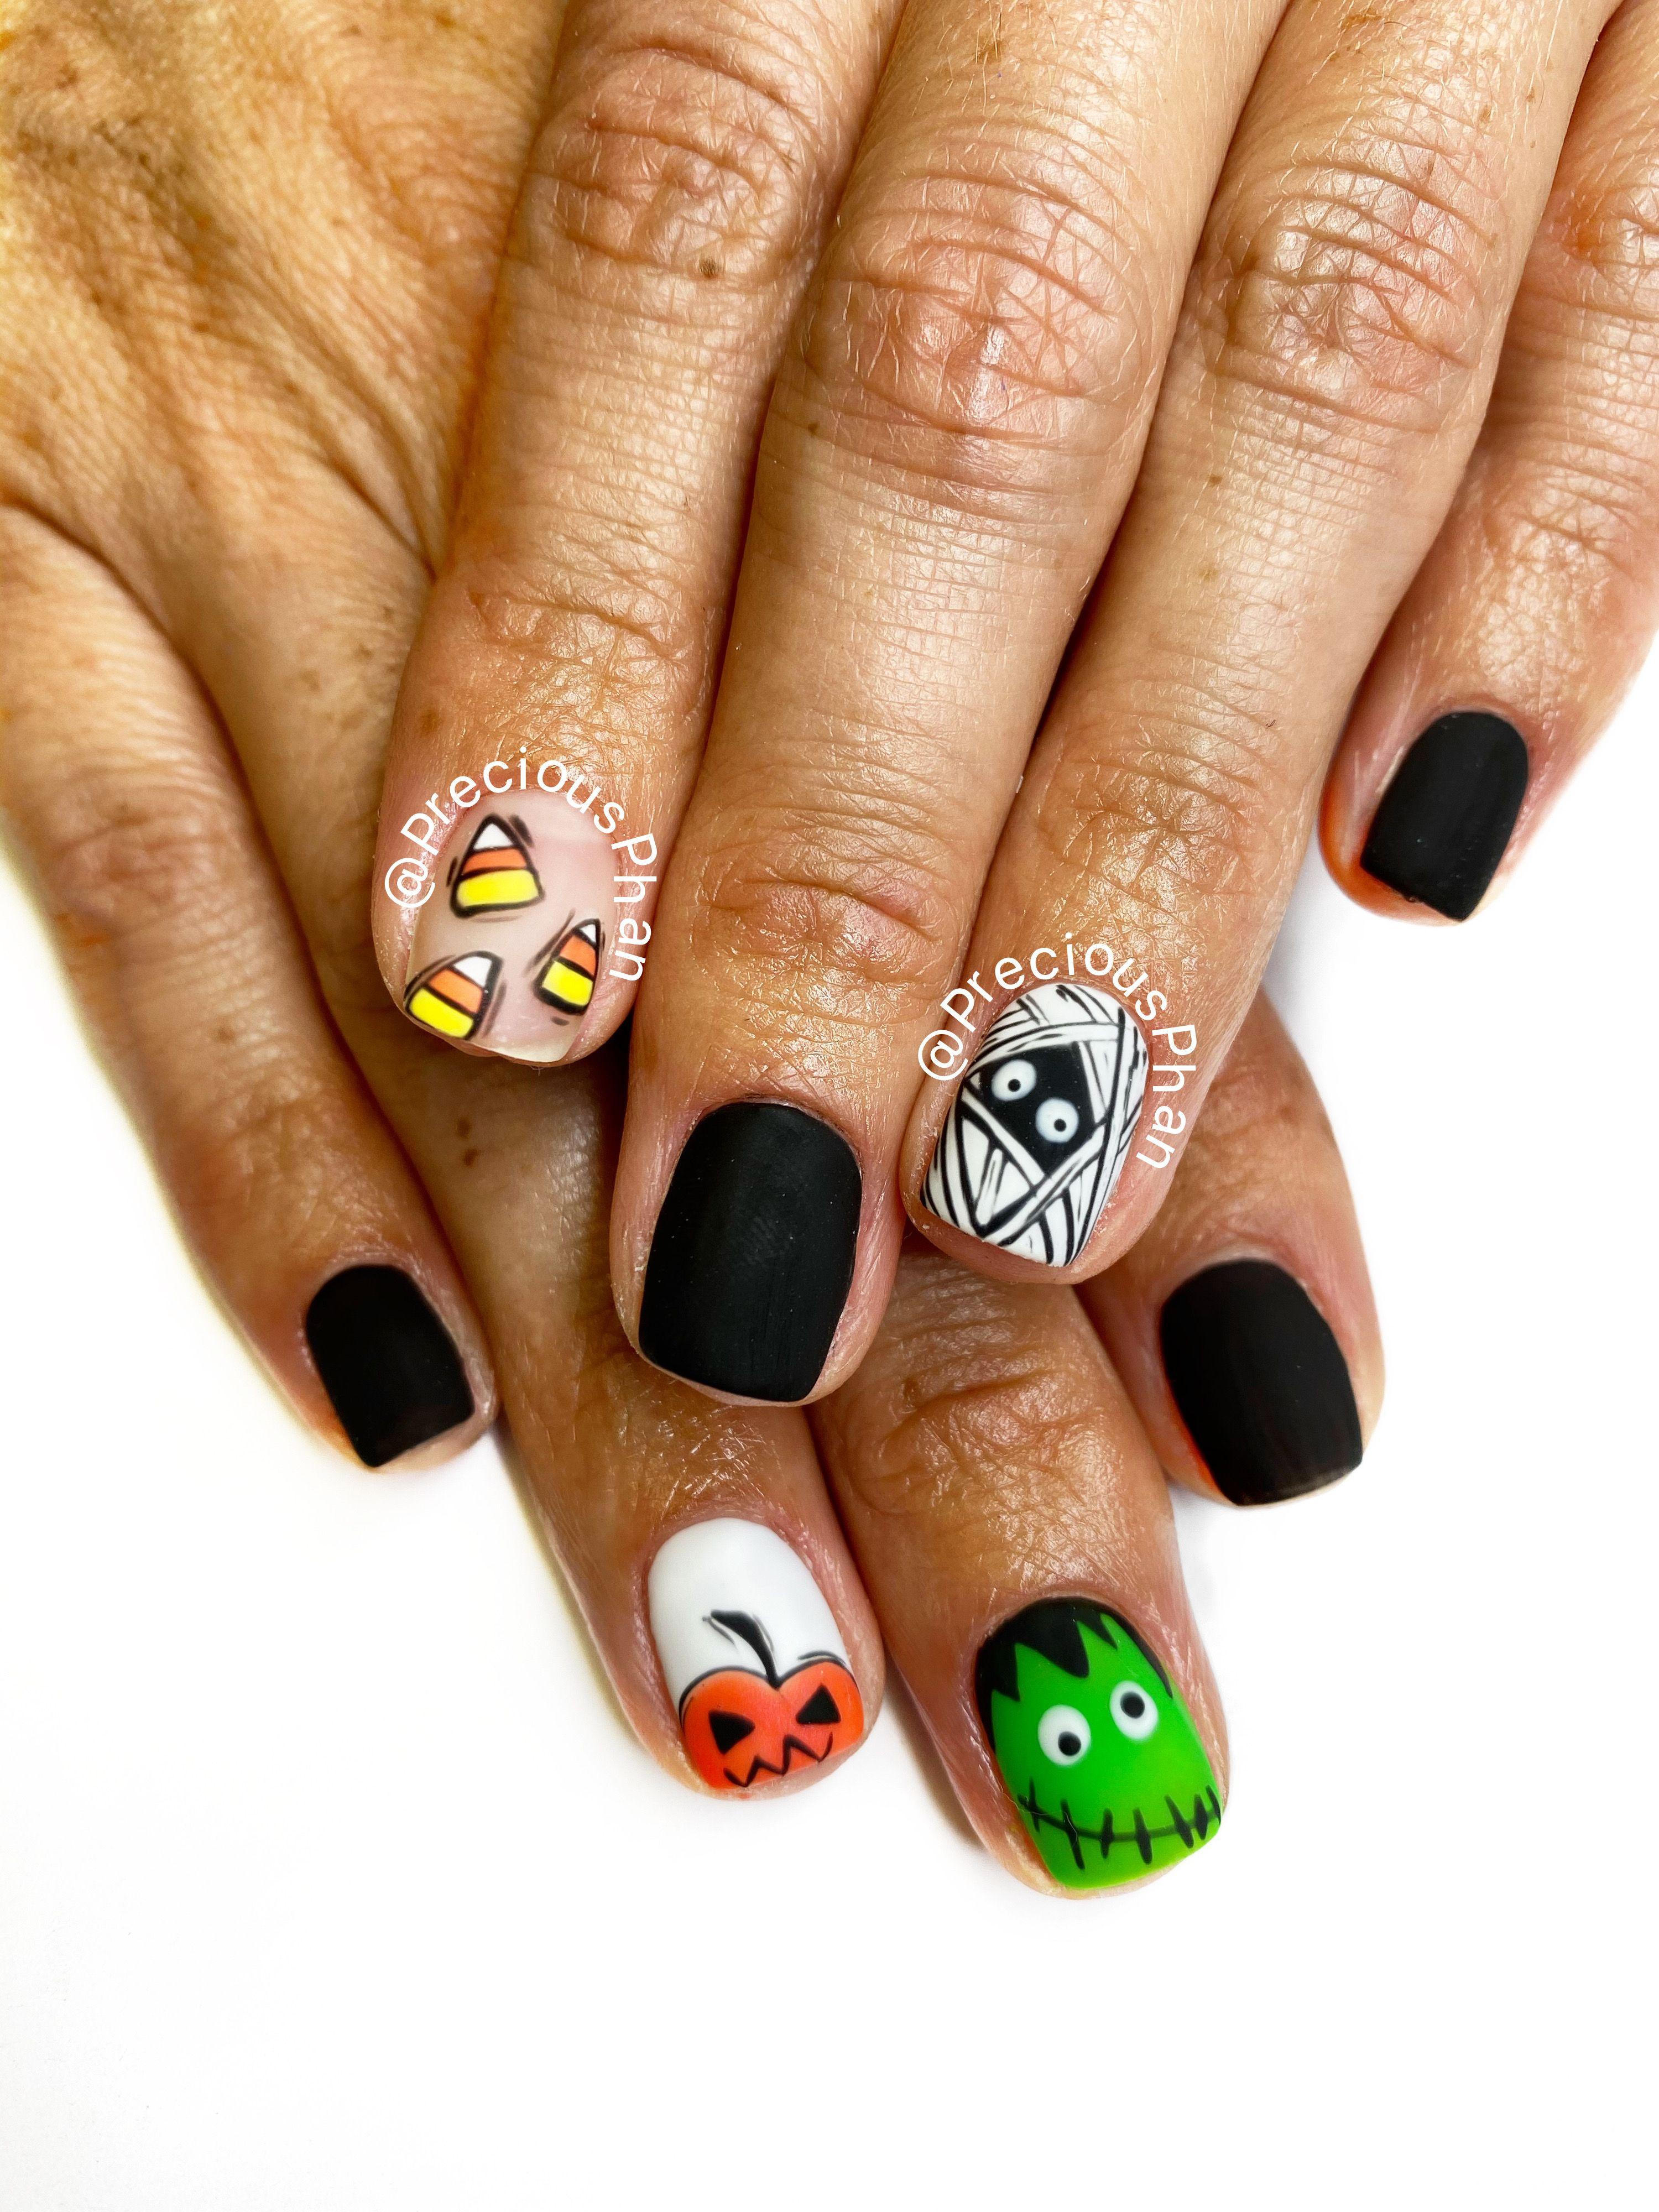 Mummy nails. Frankenstein nails. Pumpkin nails. Candy corn ...